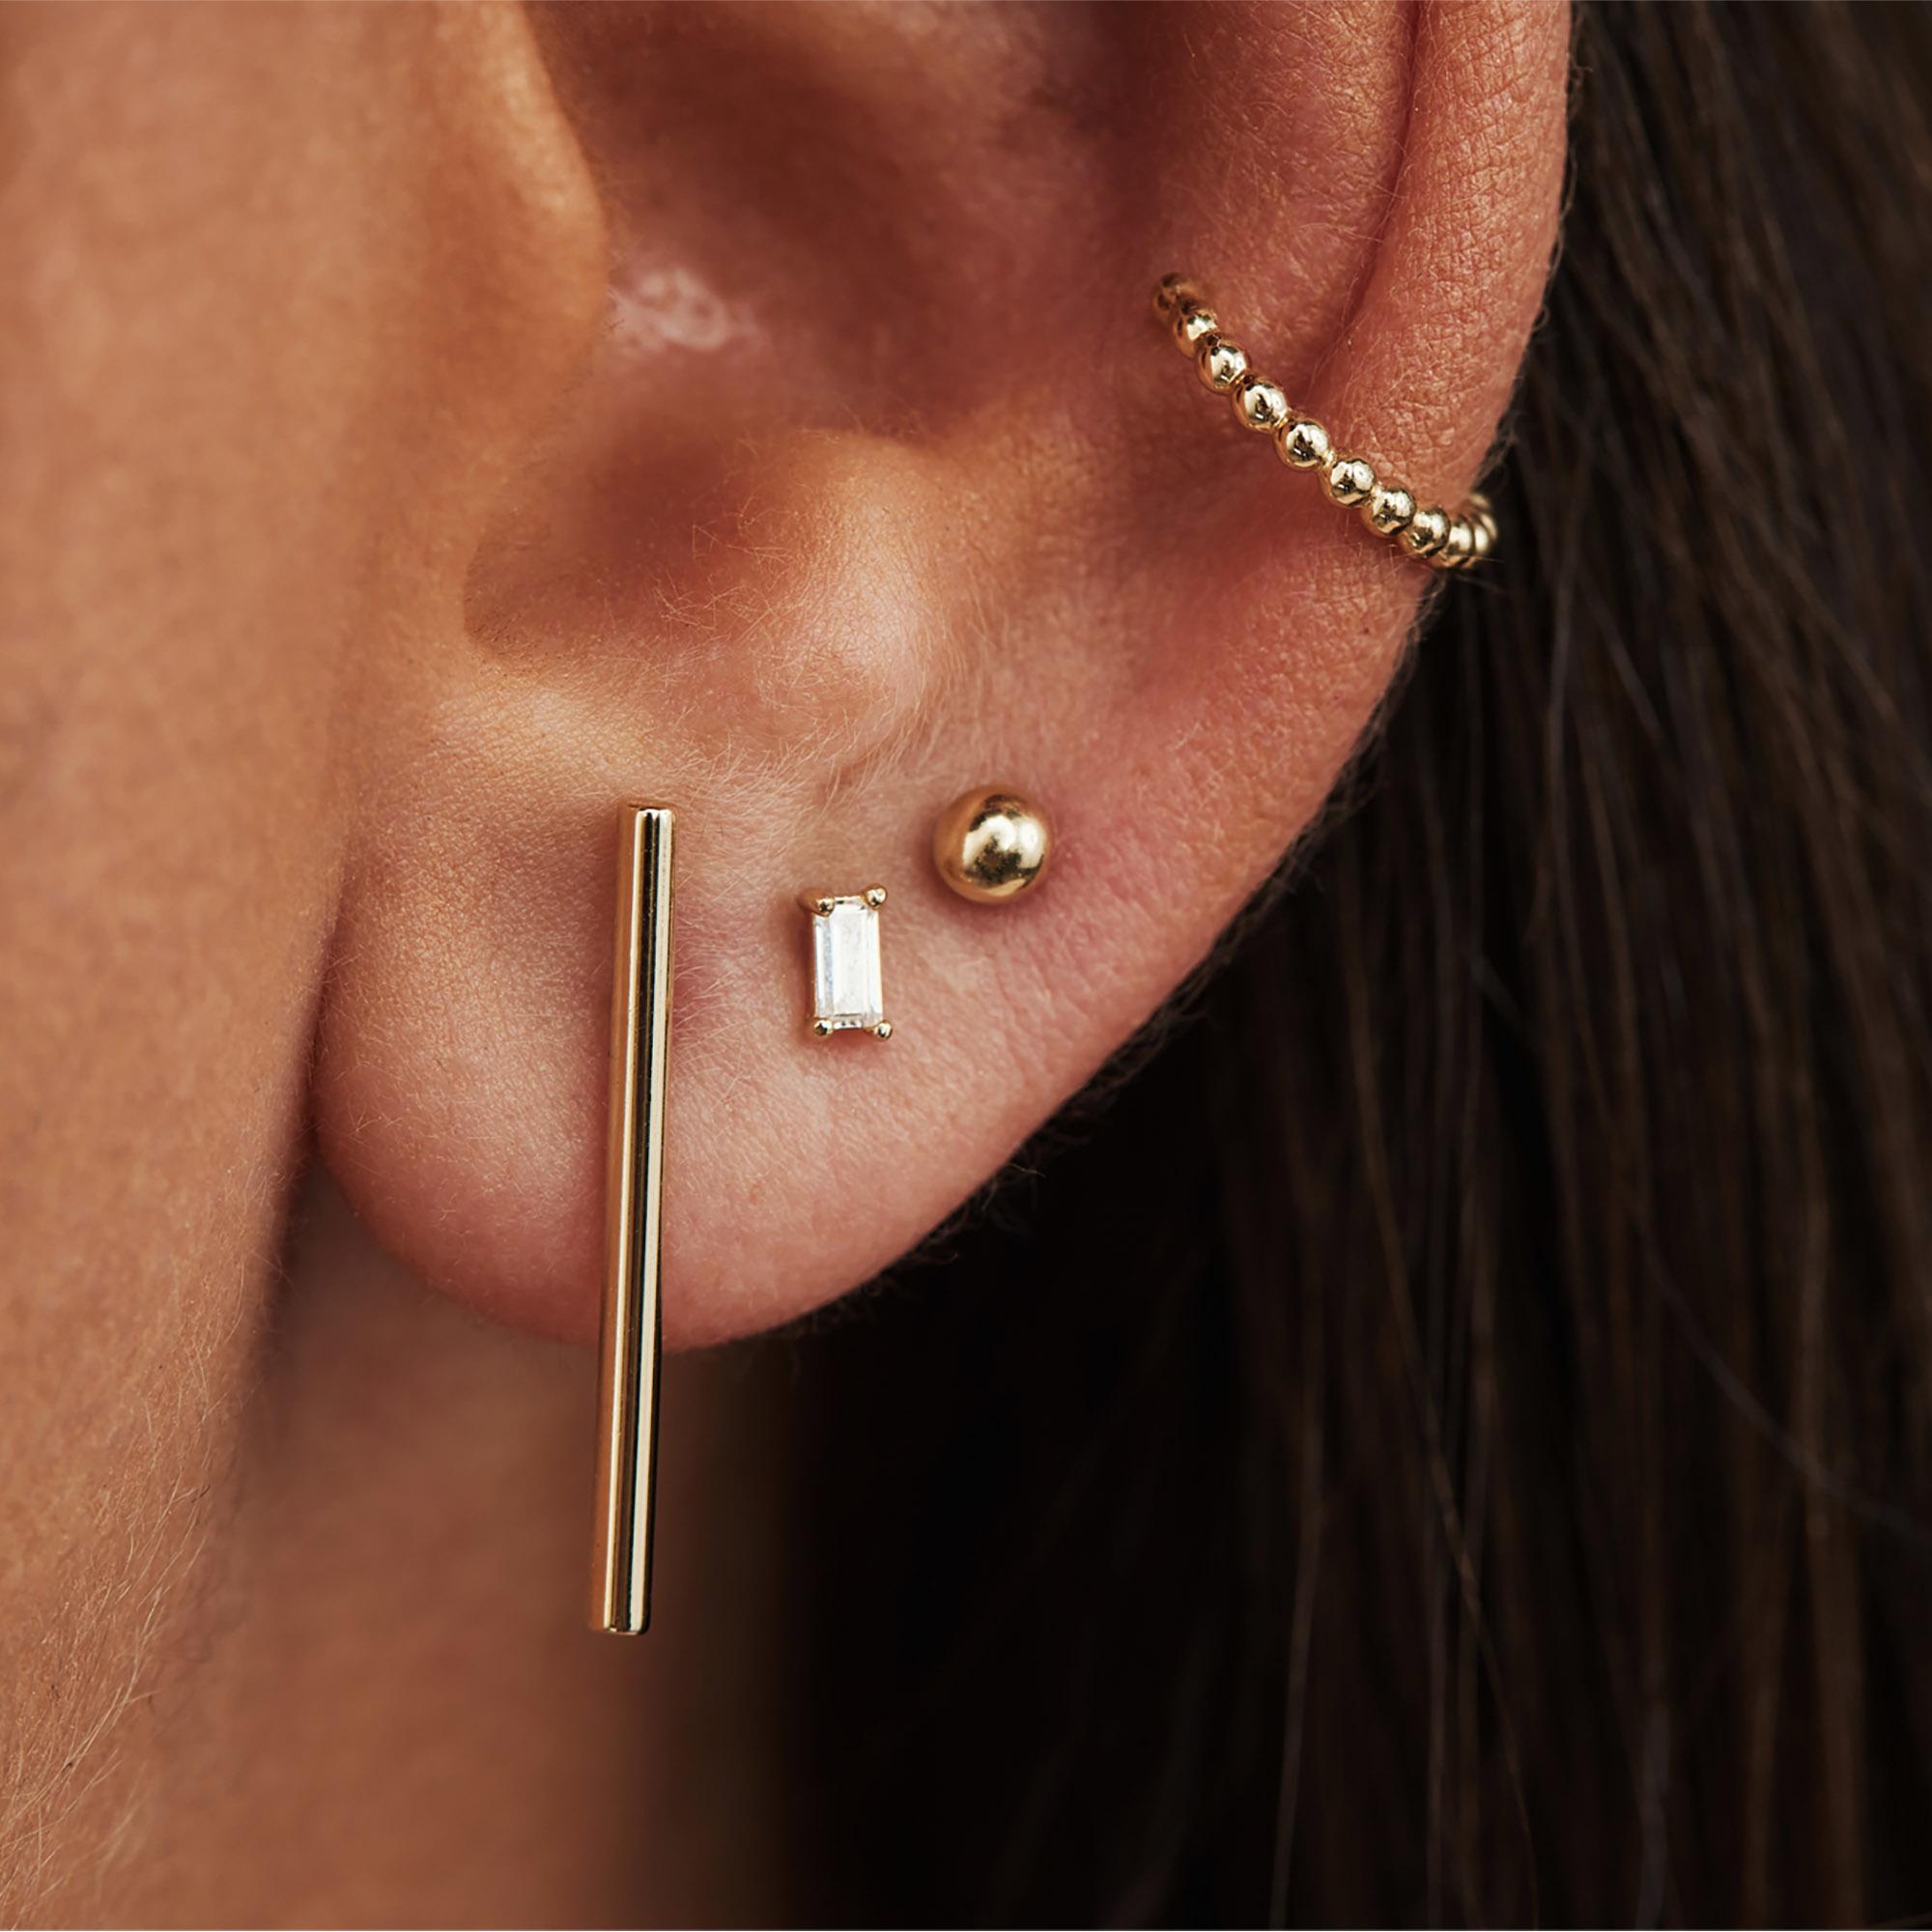 Isabel Bernard Le Marais Chéri 14 karaat gouden enkele ear cuff met bolletjes